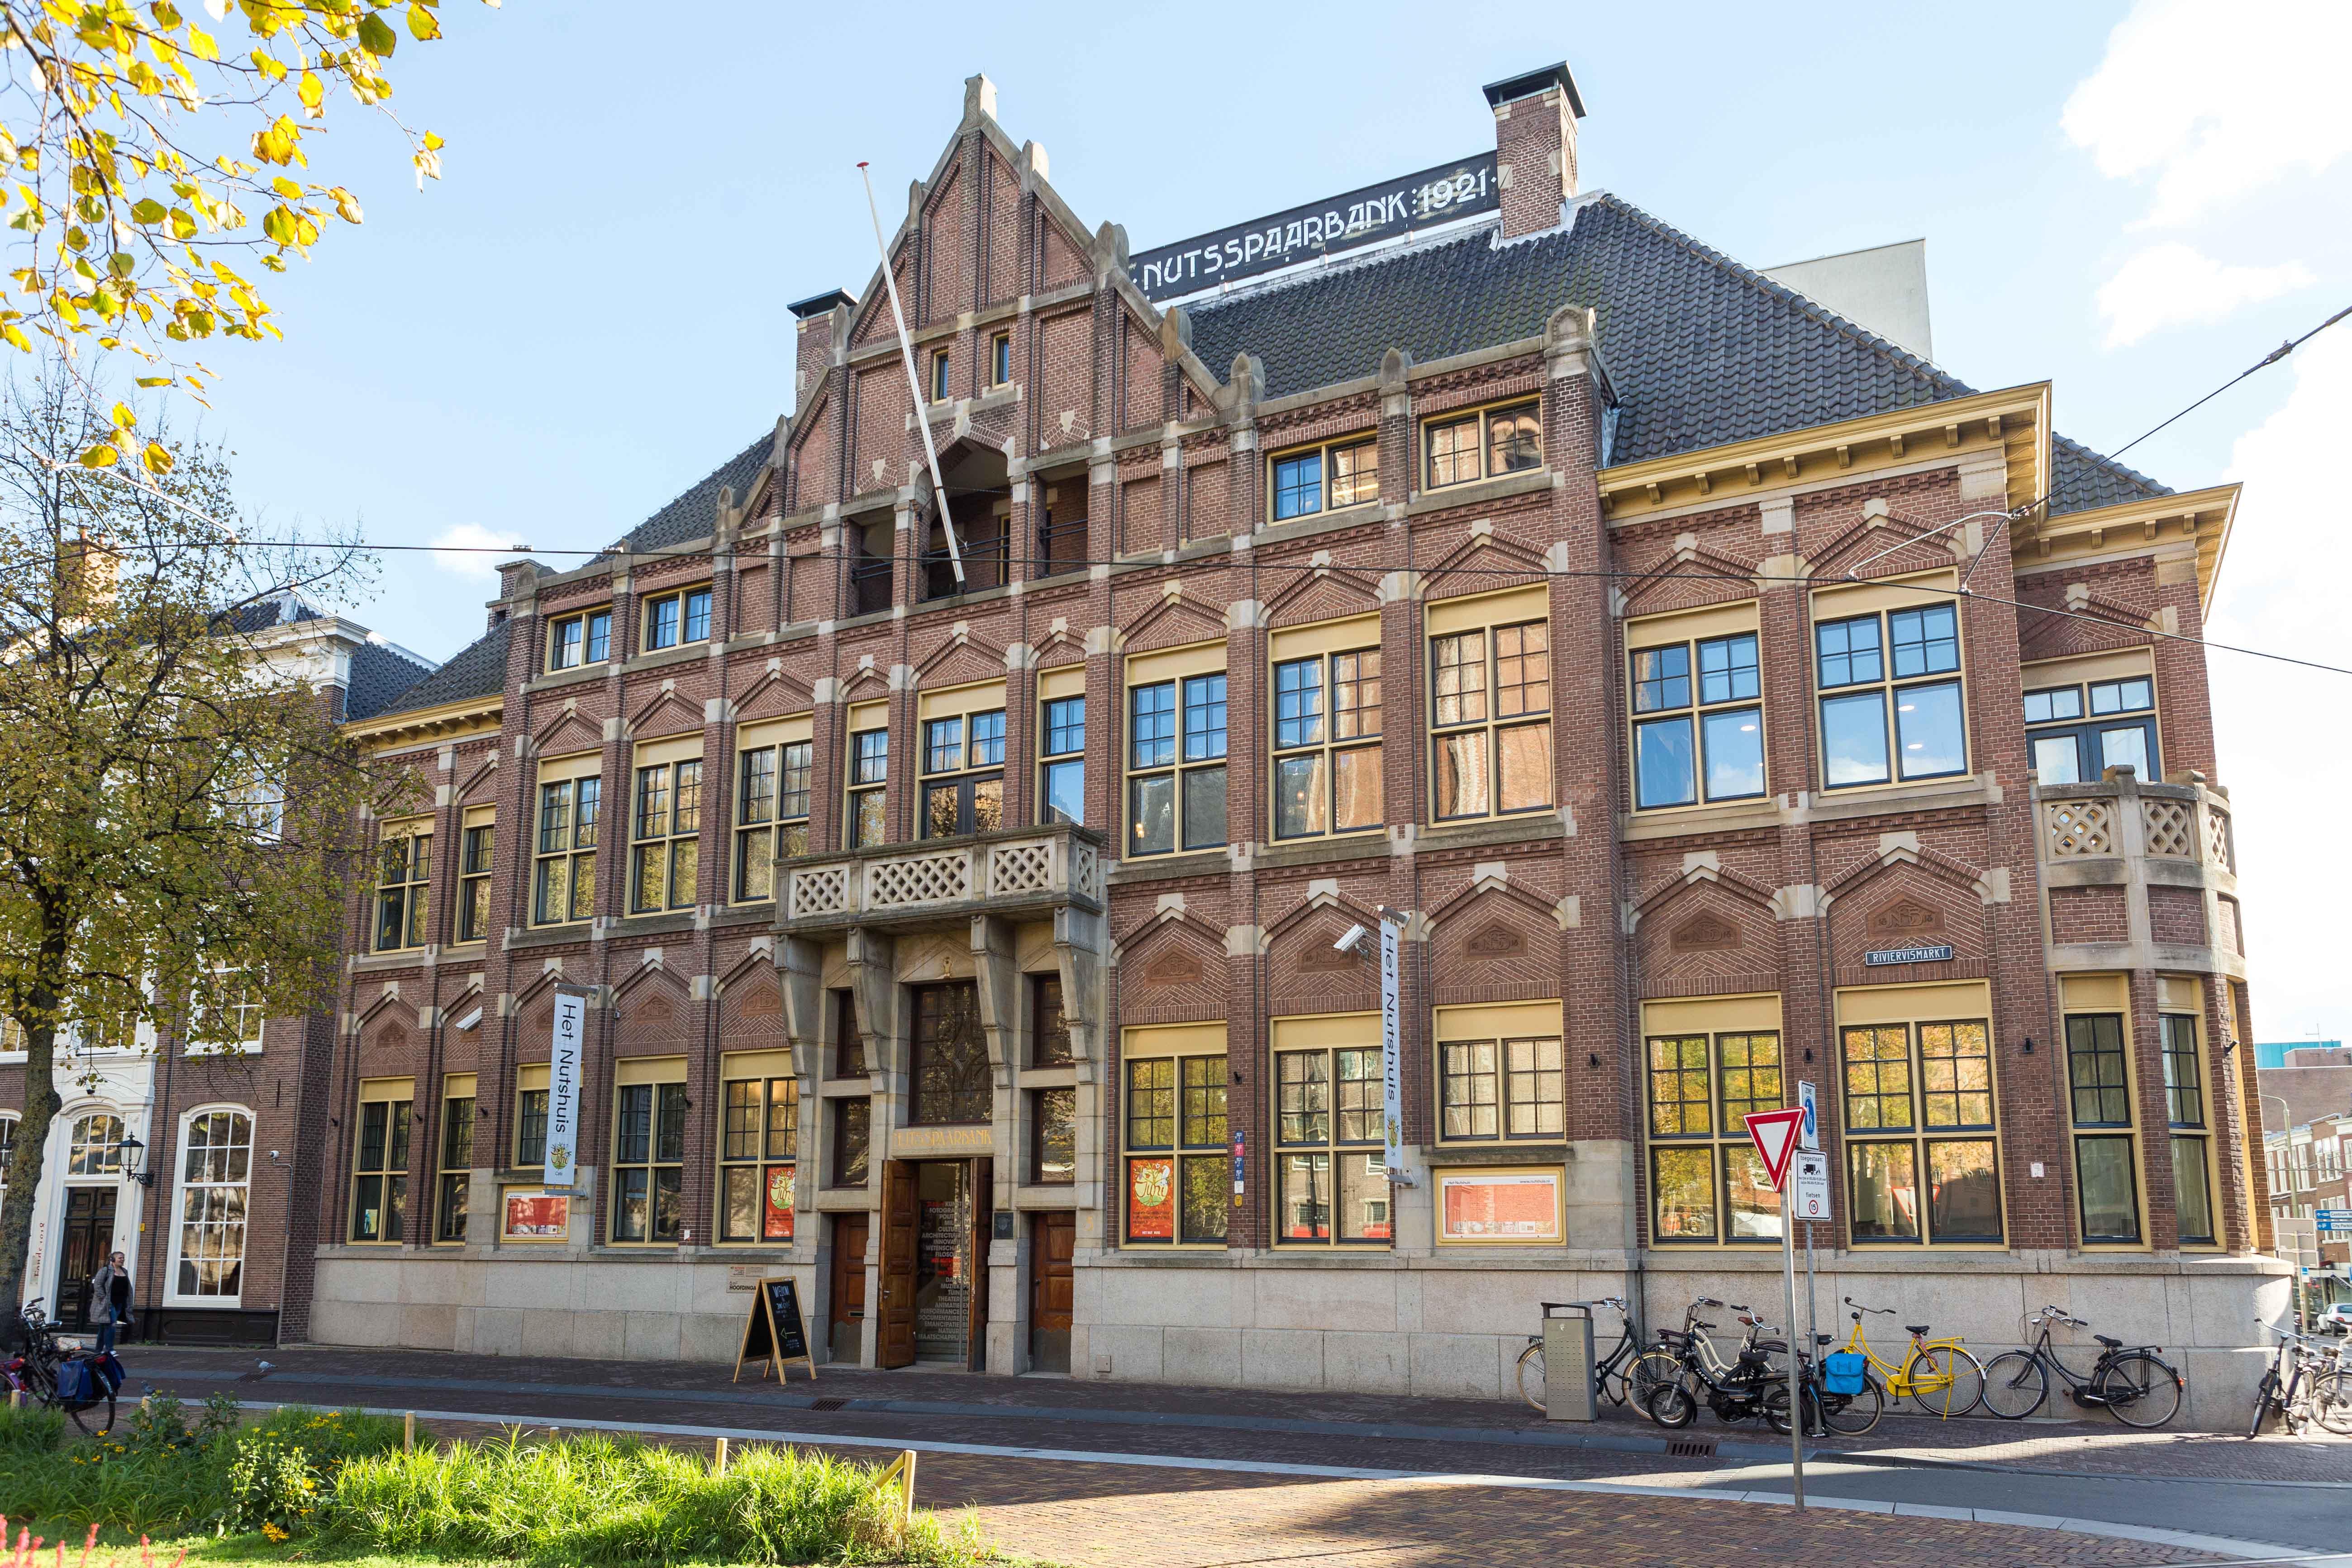 Gevel Nutshuis Den Haag